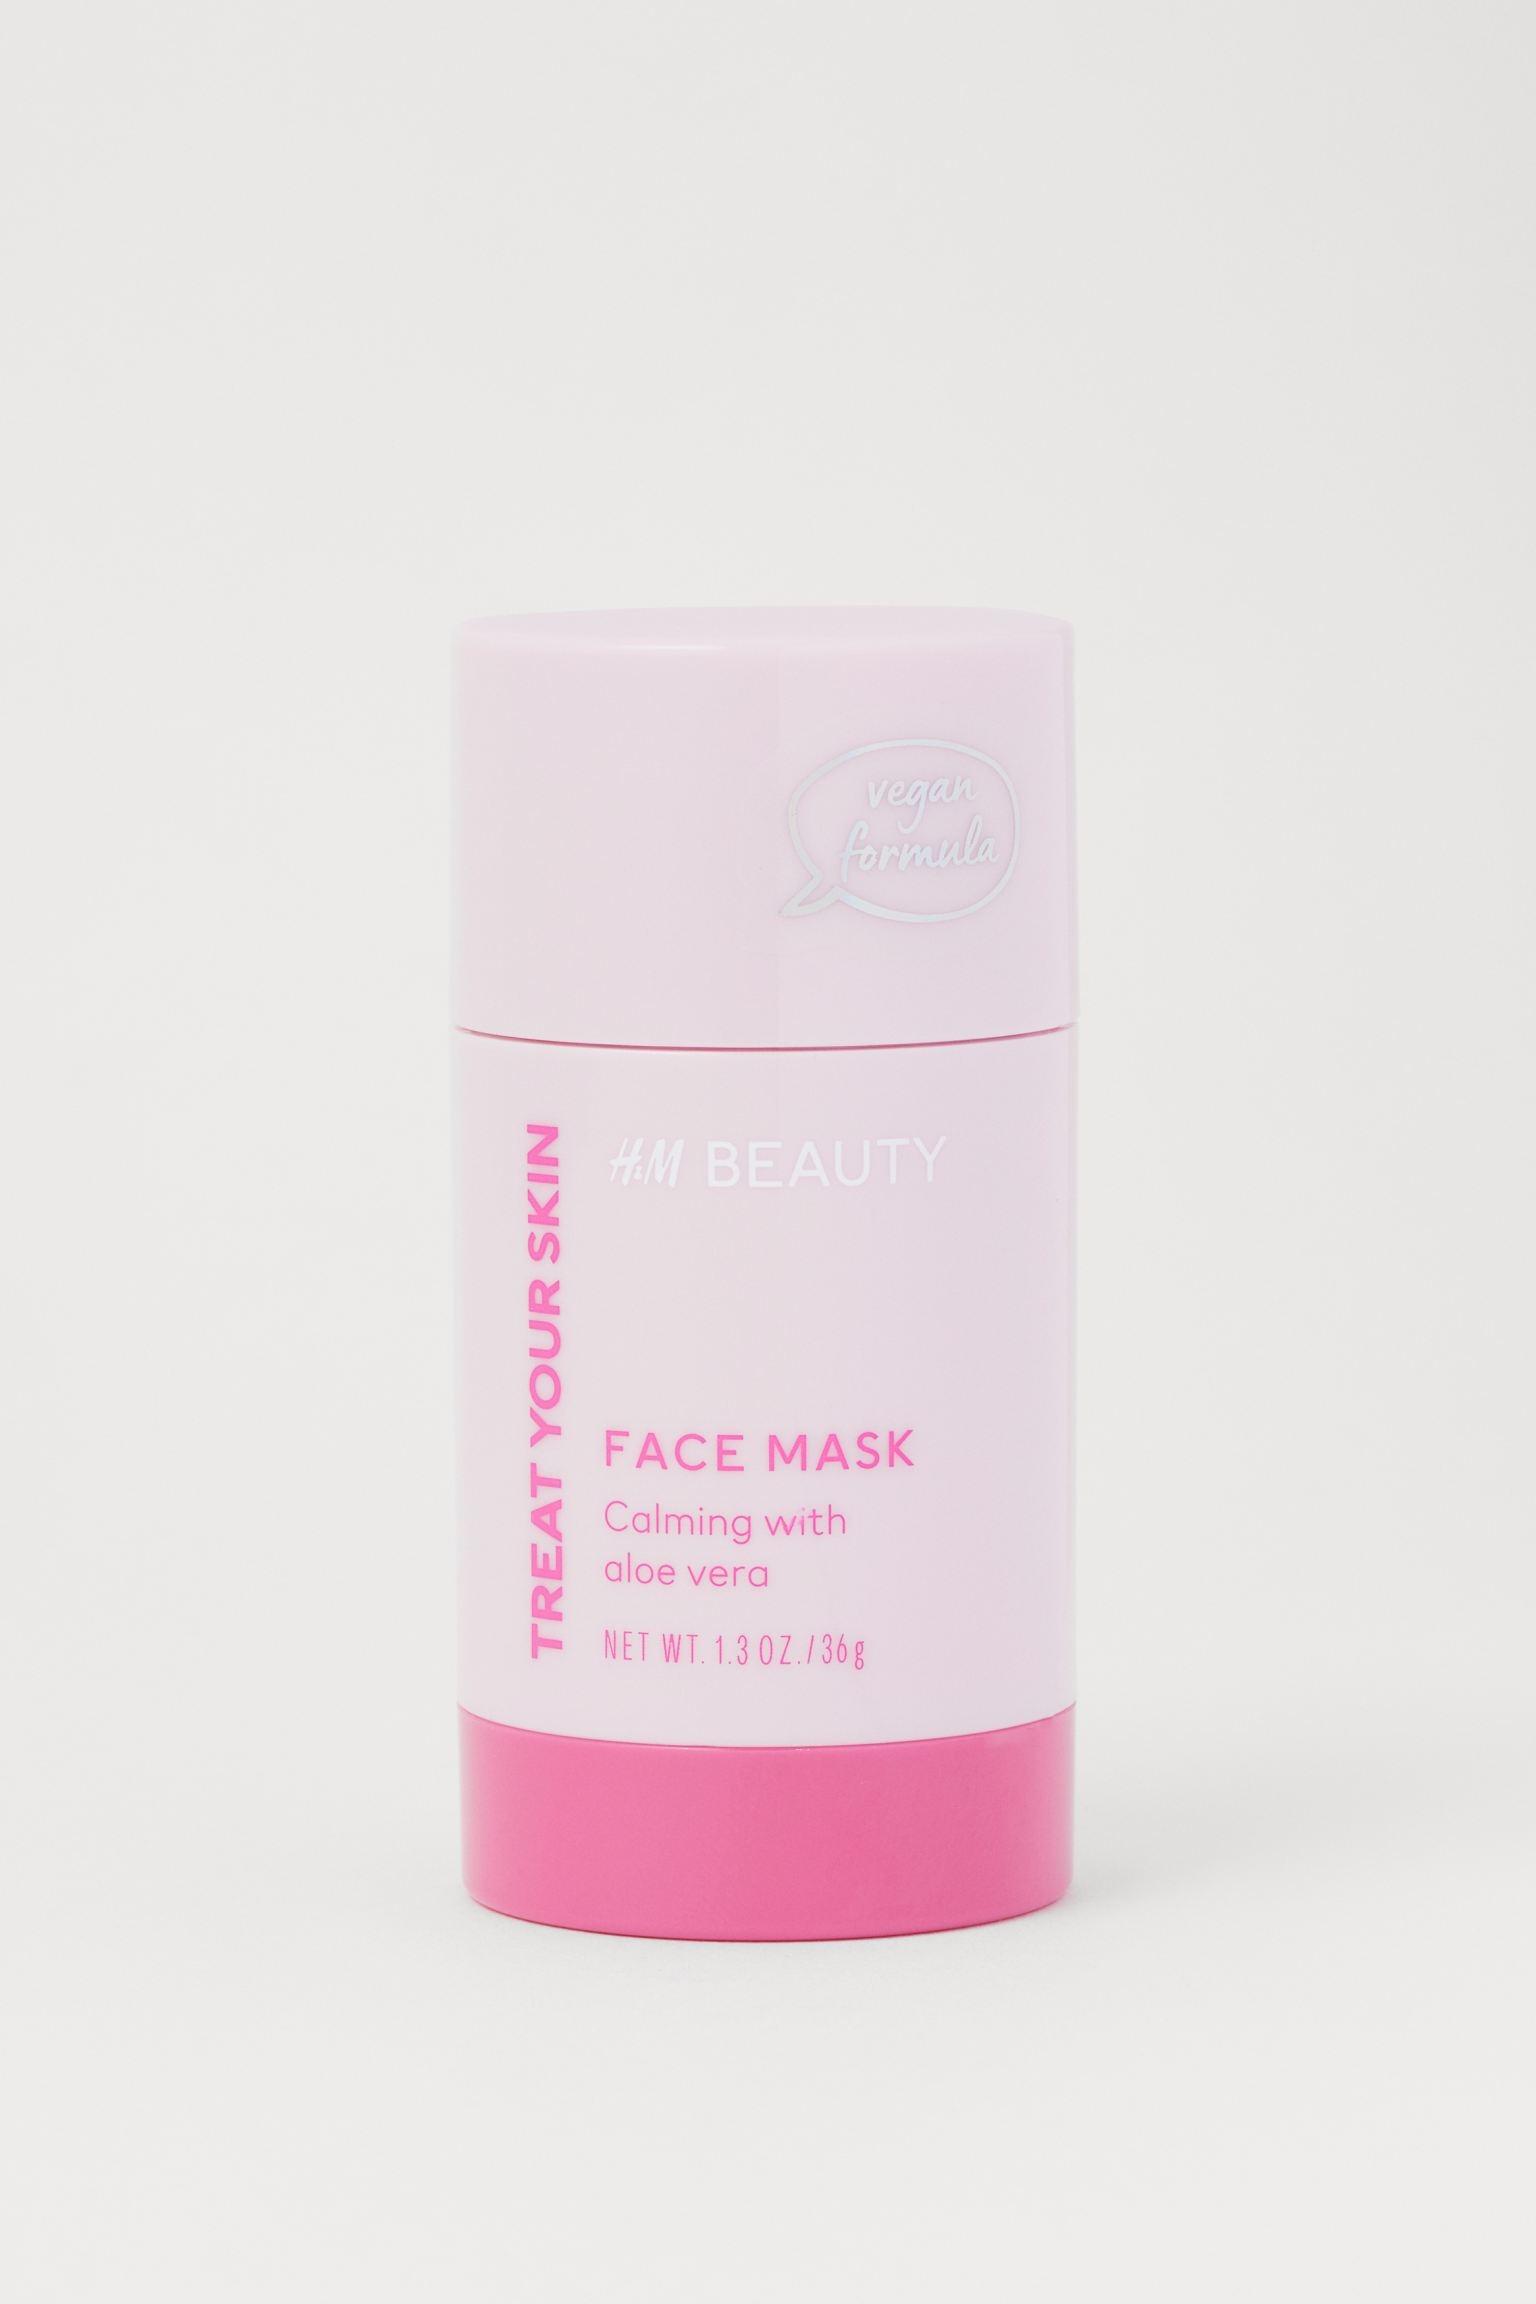 Treat Your Skin